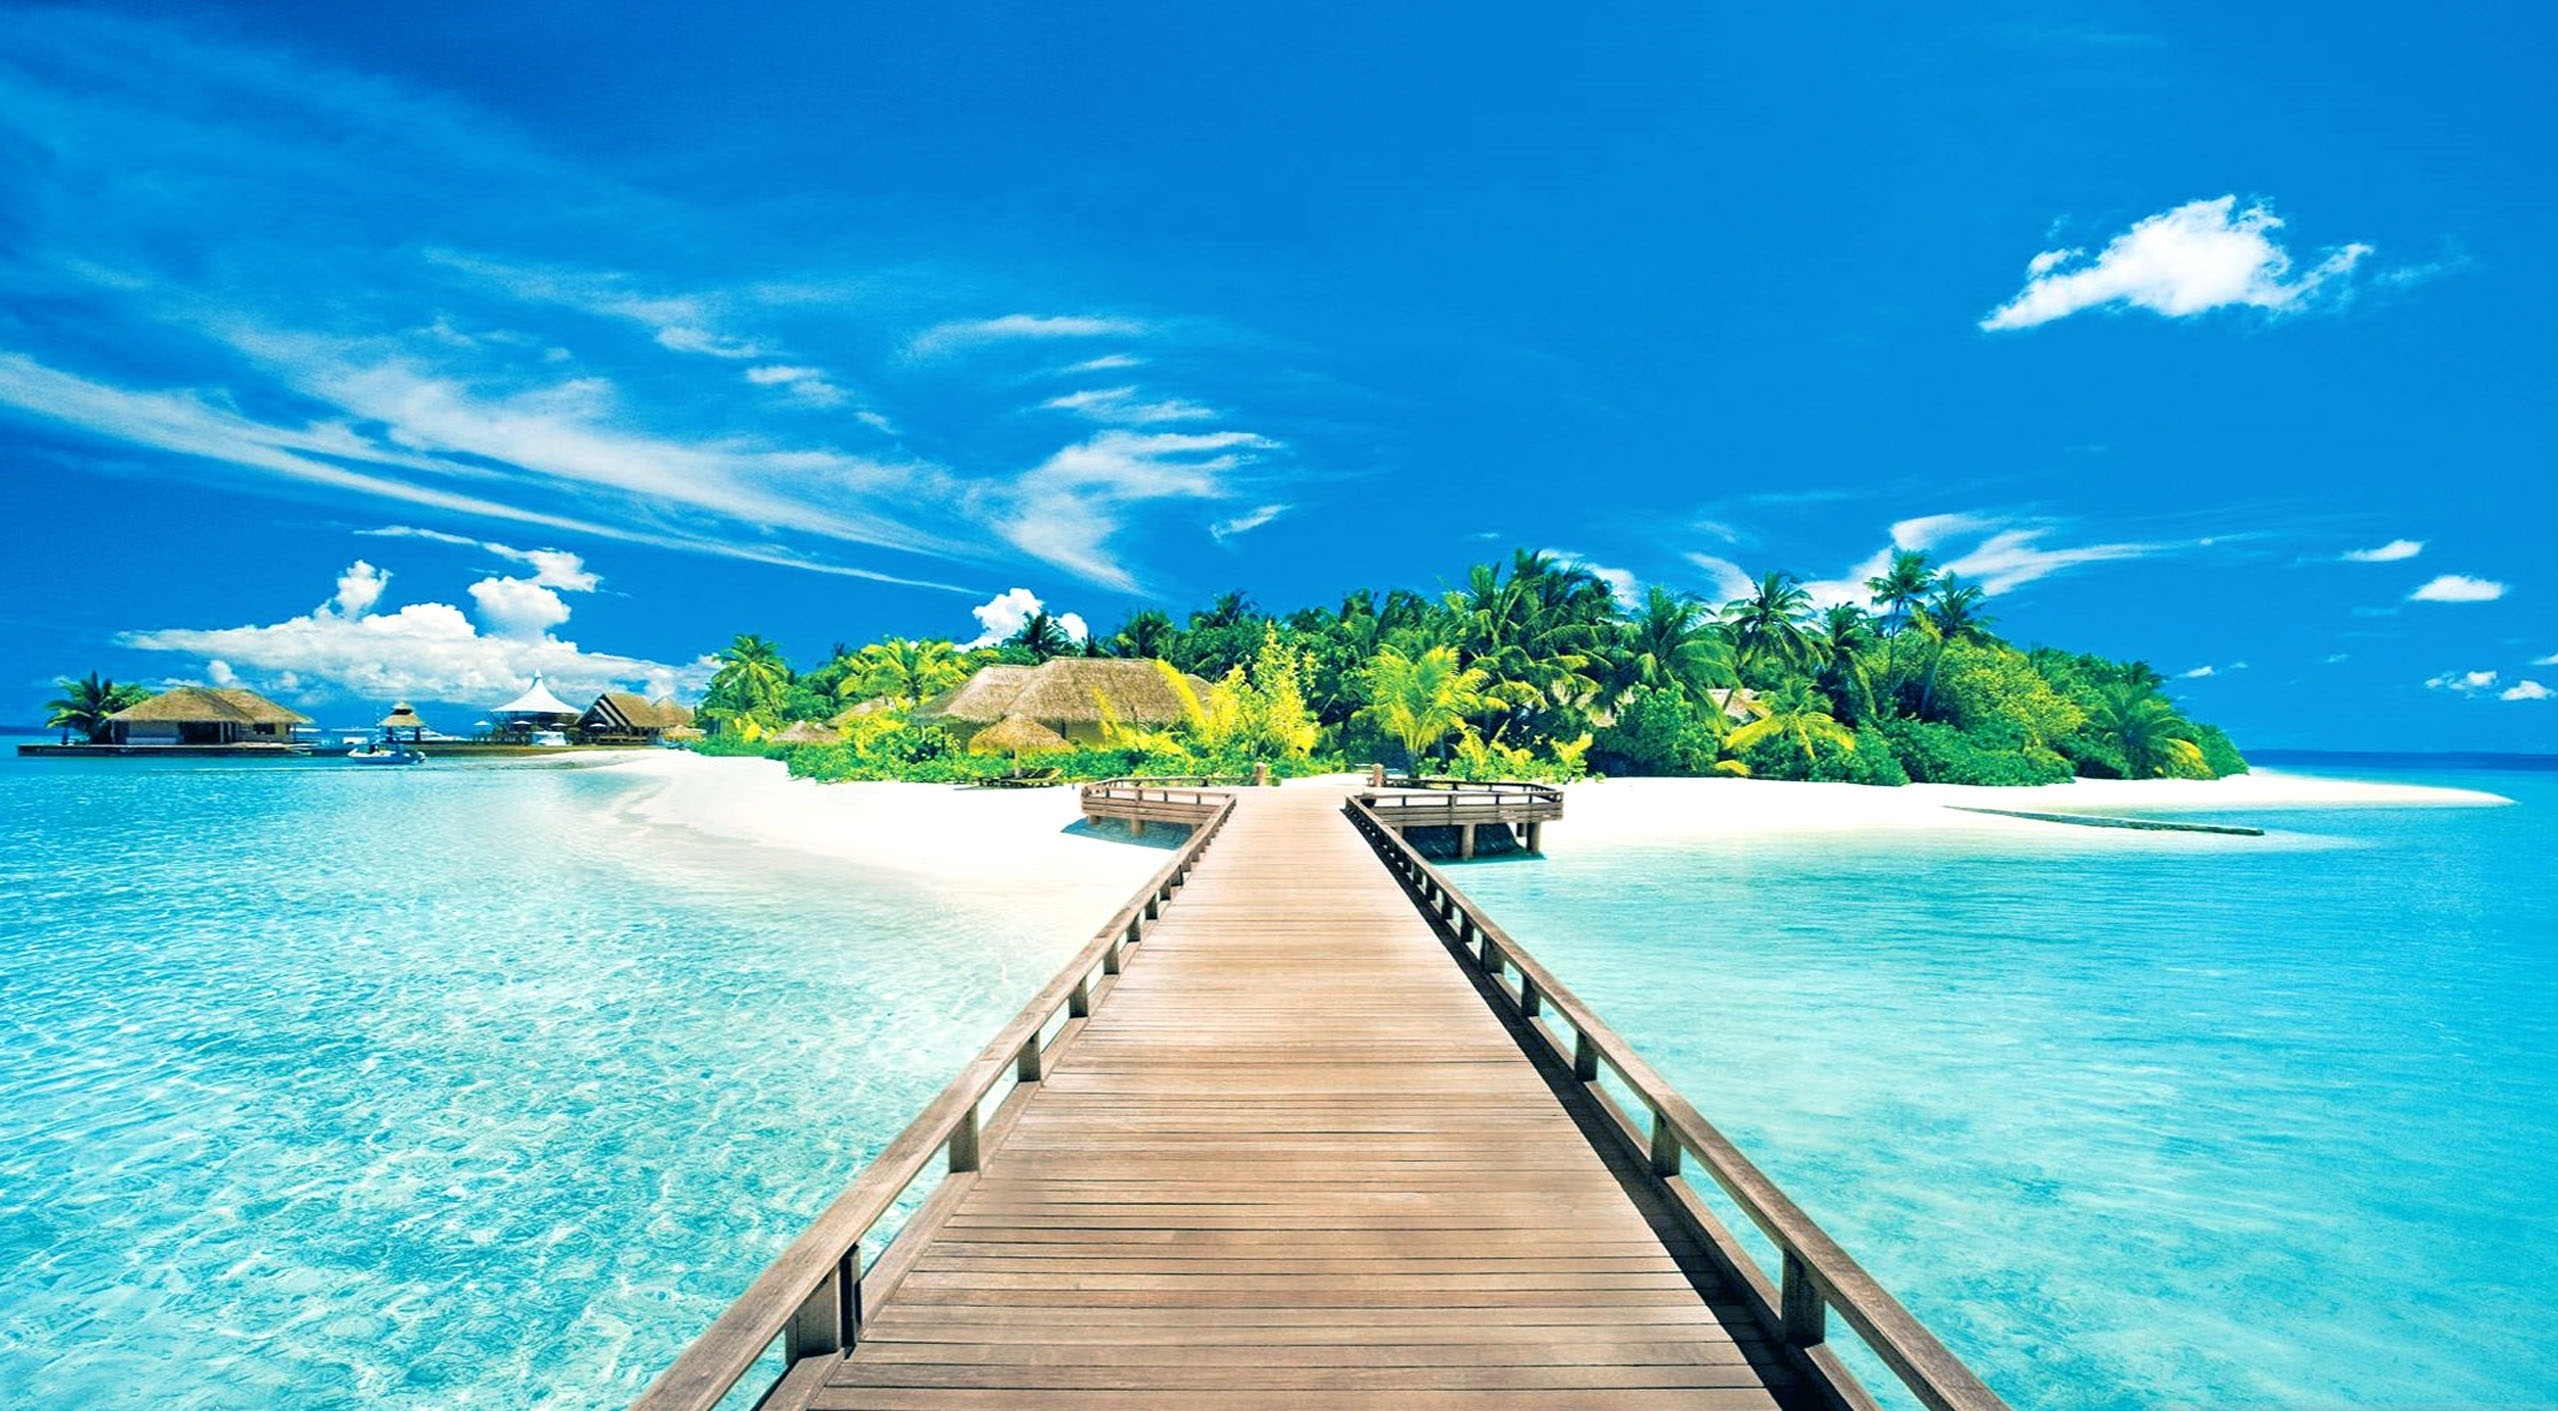 beautiful-summer-desktop - media file | pixelstalk